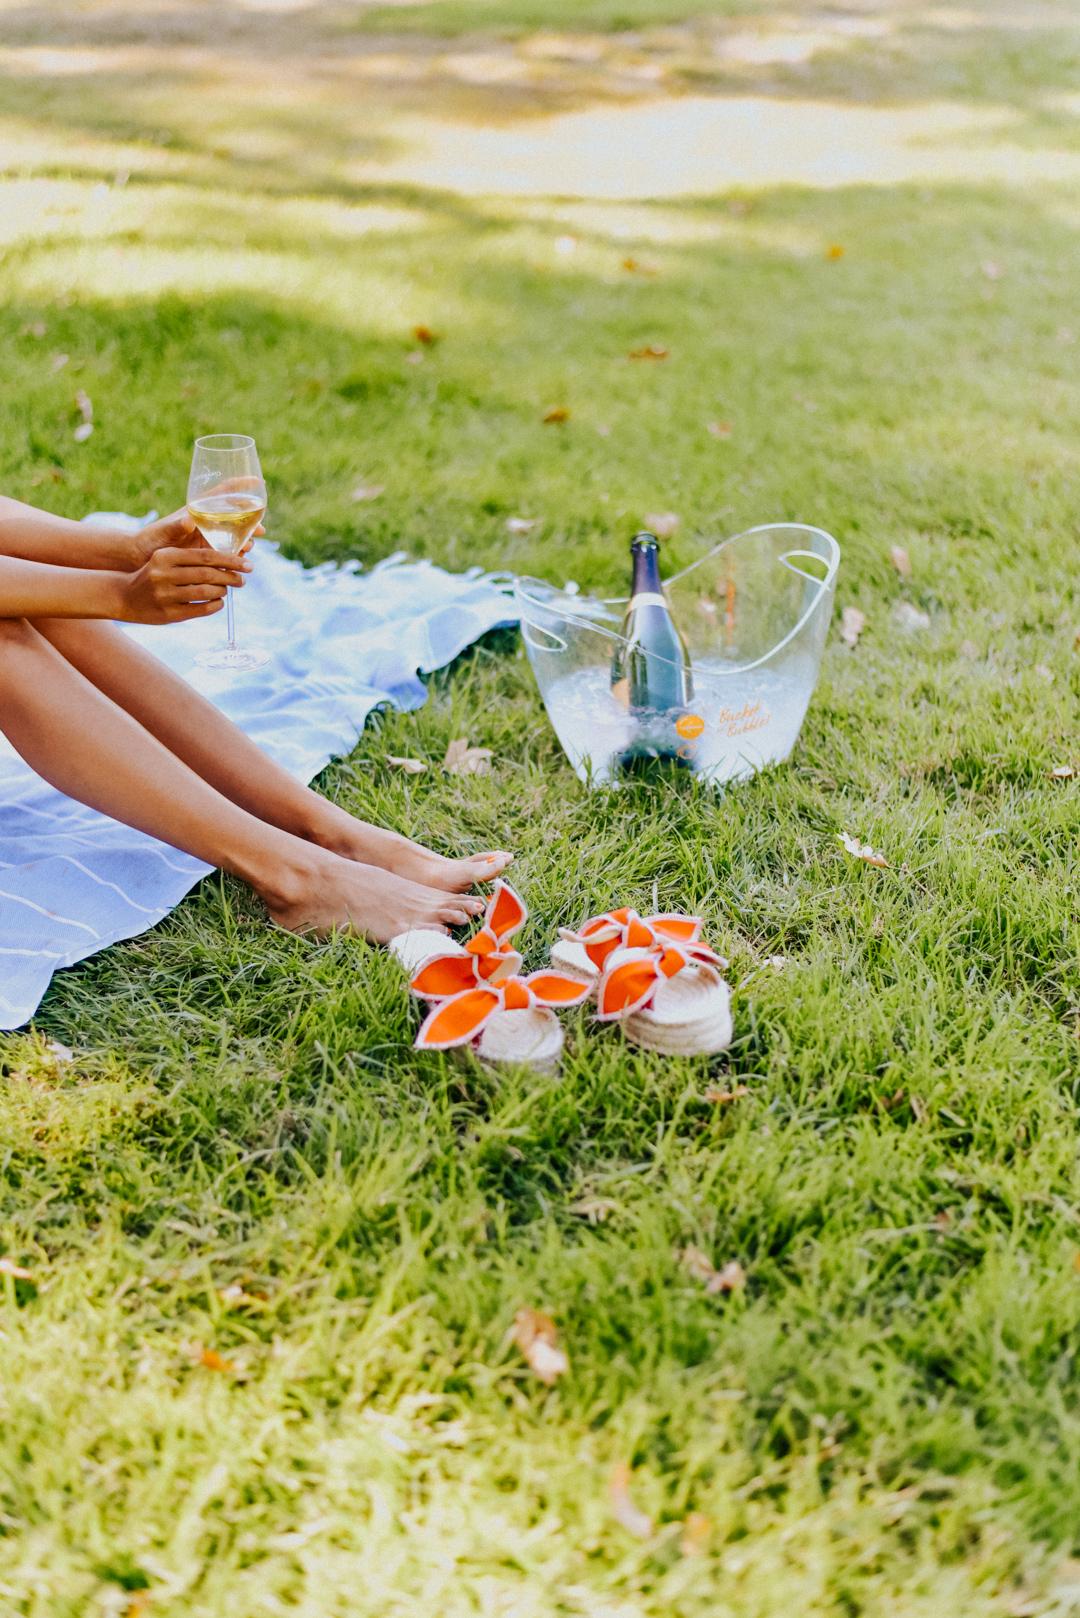 Napa-valley-roadtrip-california-summer-picnic 3